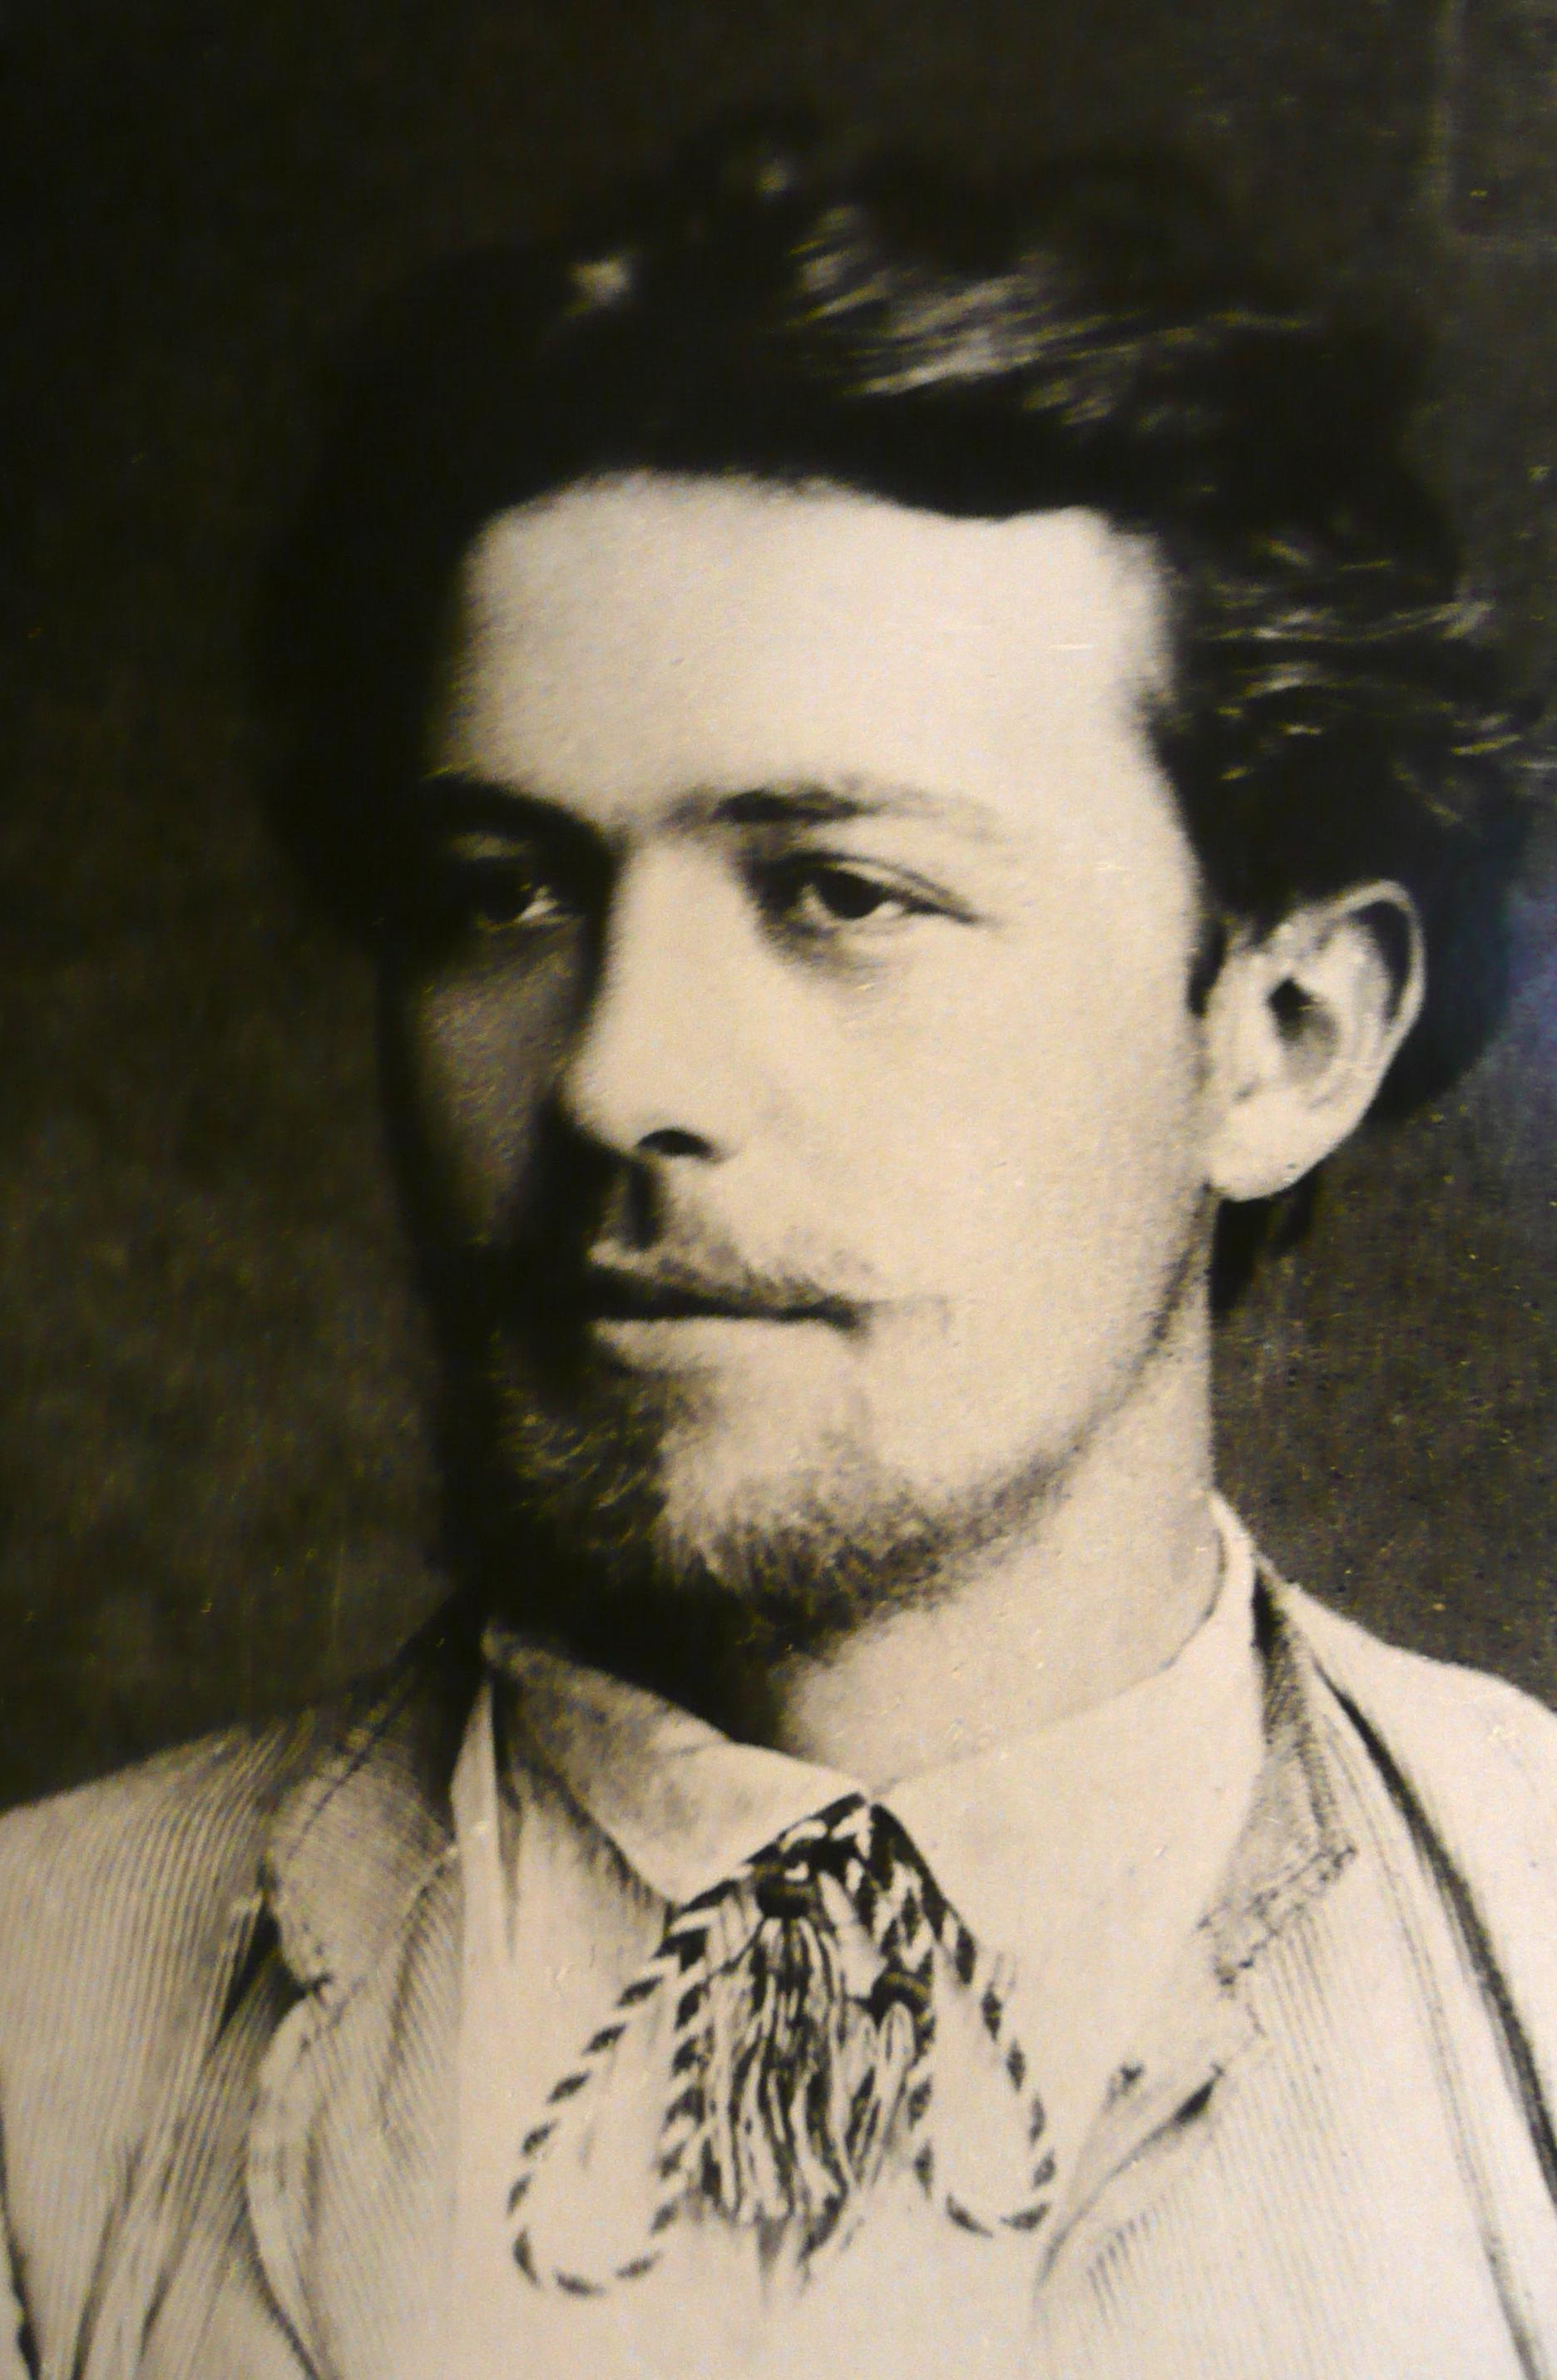 Anton Pavlovich Chekhov - 8 rules for educated person 30